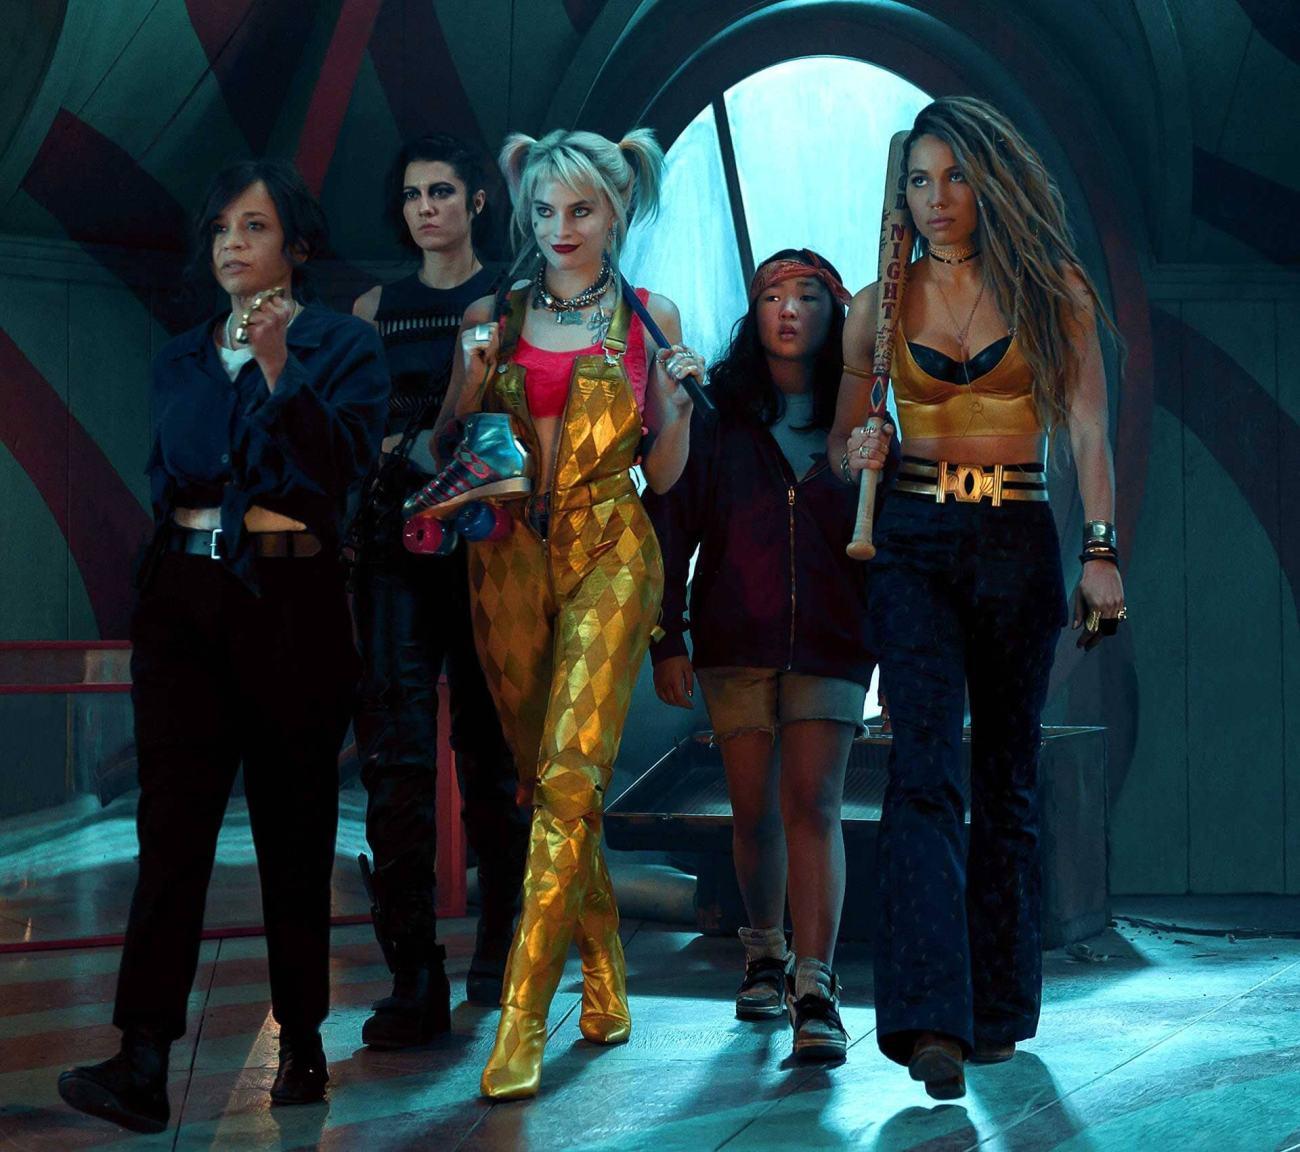 Renée Montoya (Rosie Pérez), The Huntress (Elizabeth Winstead), Harley Quinn (Margot Robbie), Cassandra Cain (Ella Jay Basco) y Black Canary (Jurnee Smollett-Bell) en Birds of Prey (2020). Imagen: warnerbros.com